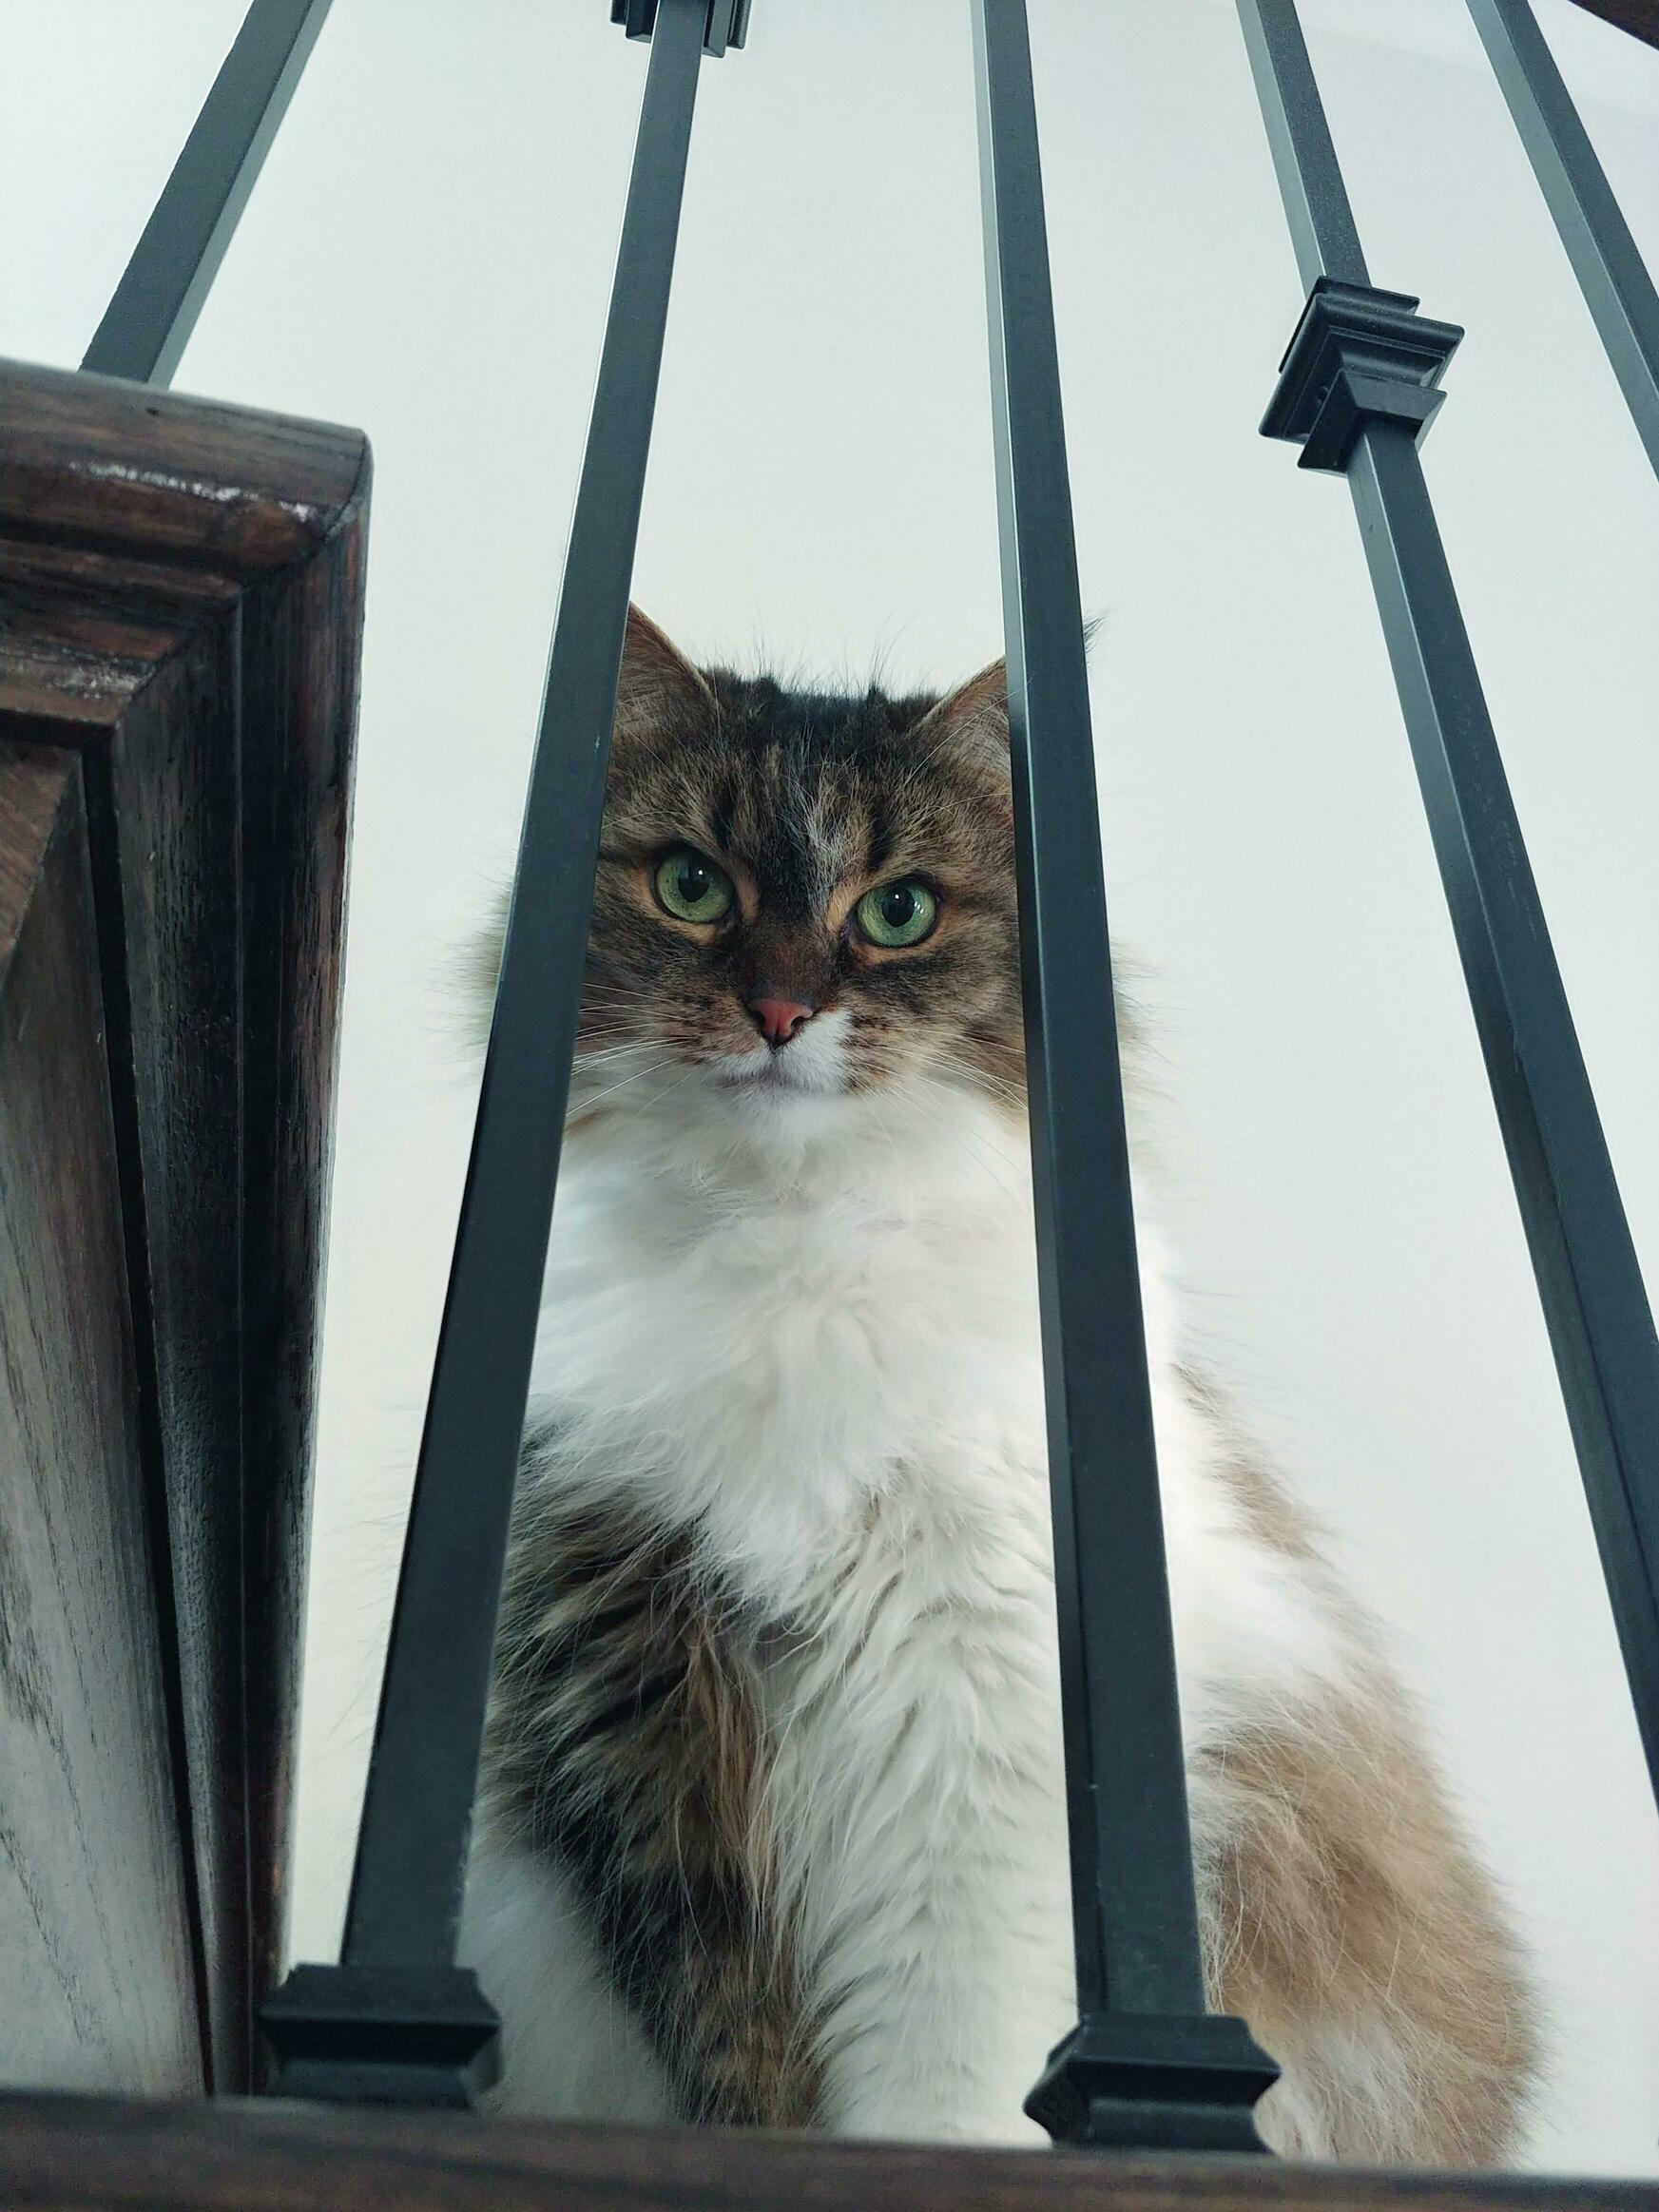 My mystical mainecoon kitty